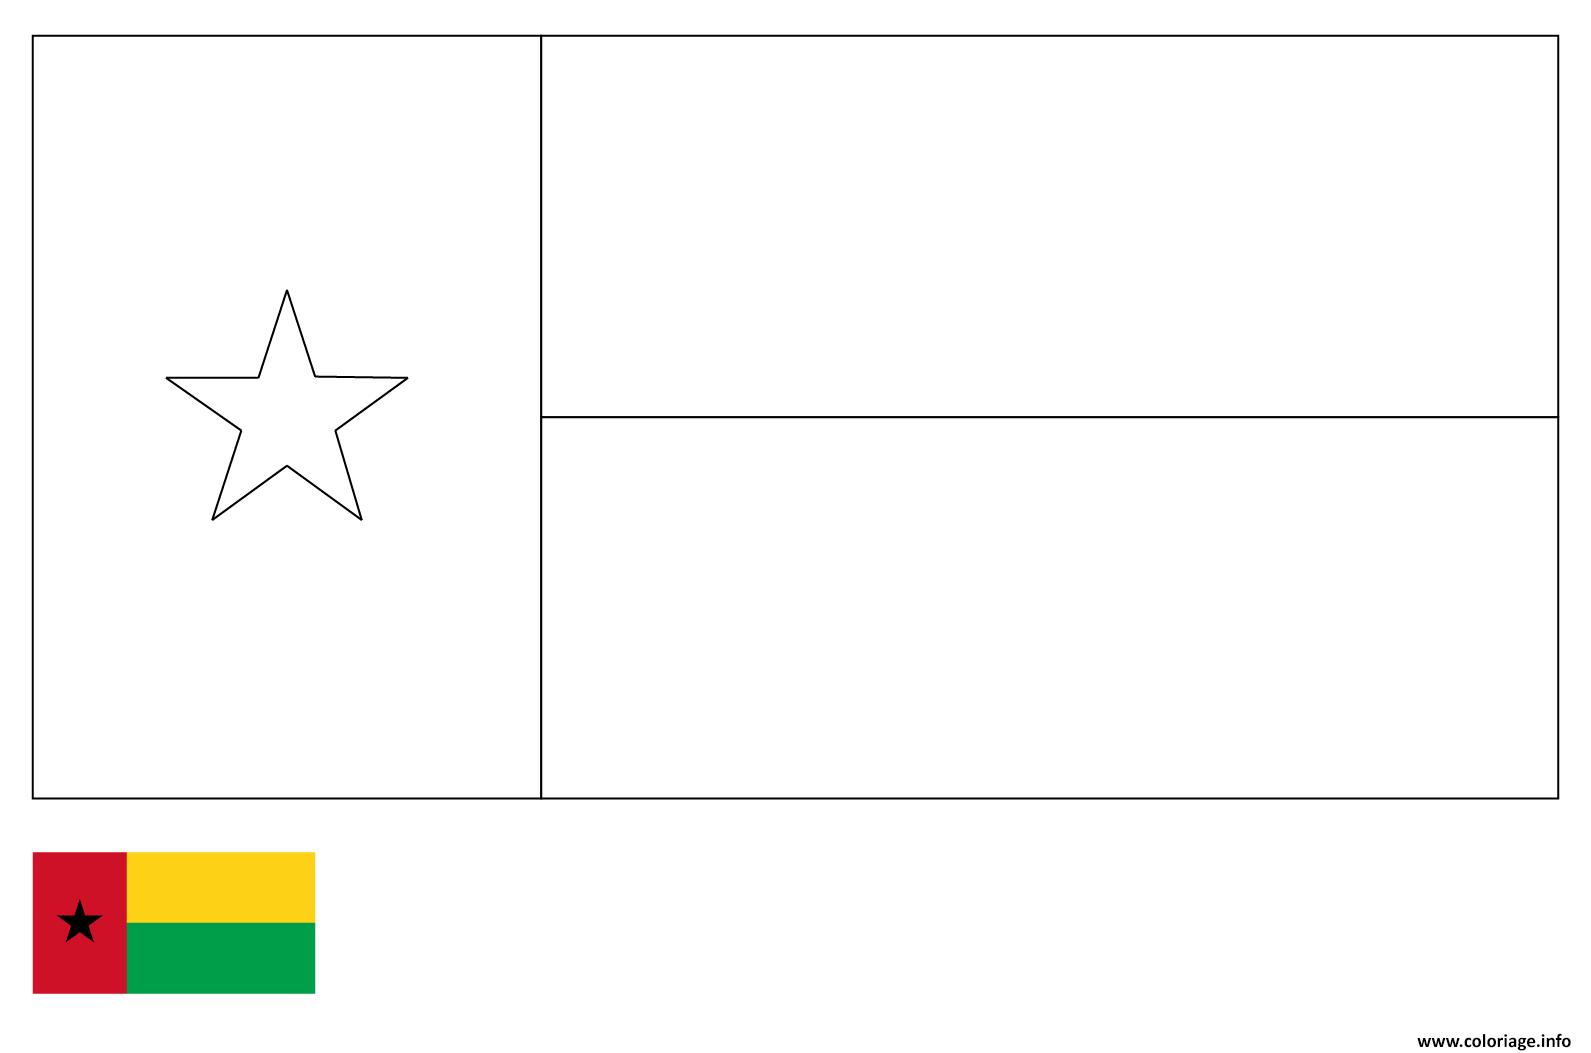 Dessin drapeau guniee Coloriage Gratuit à Imprimer